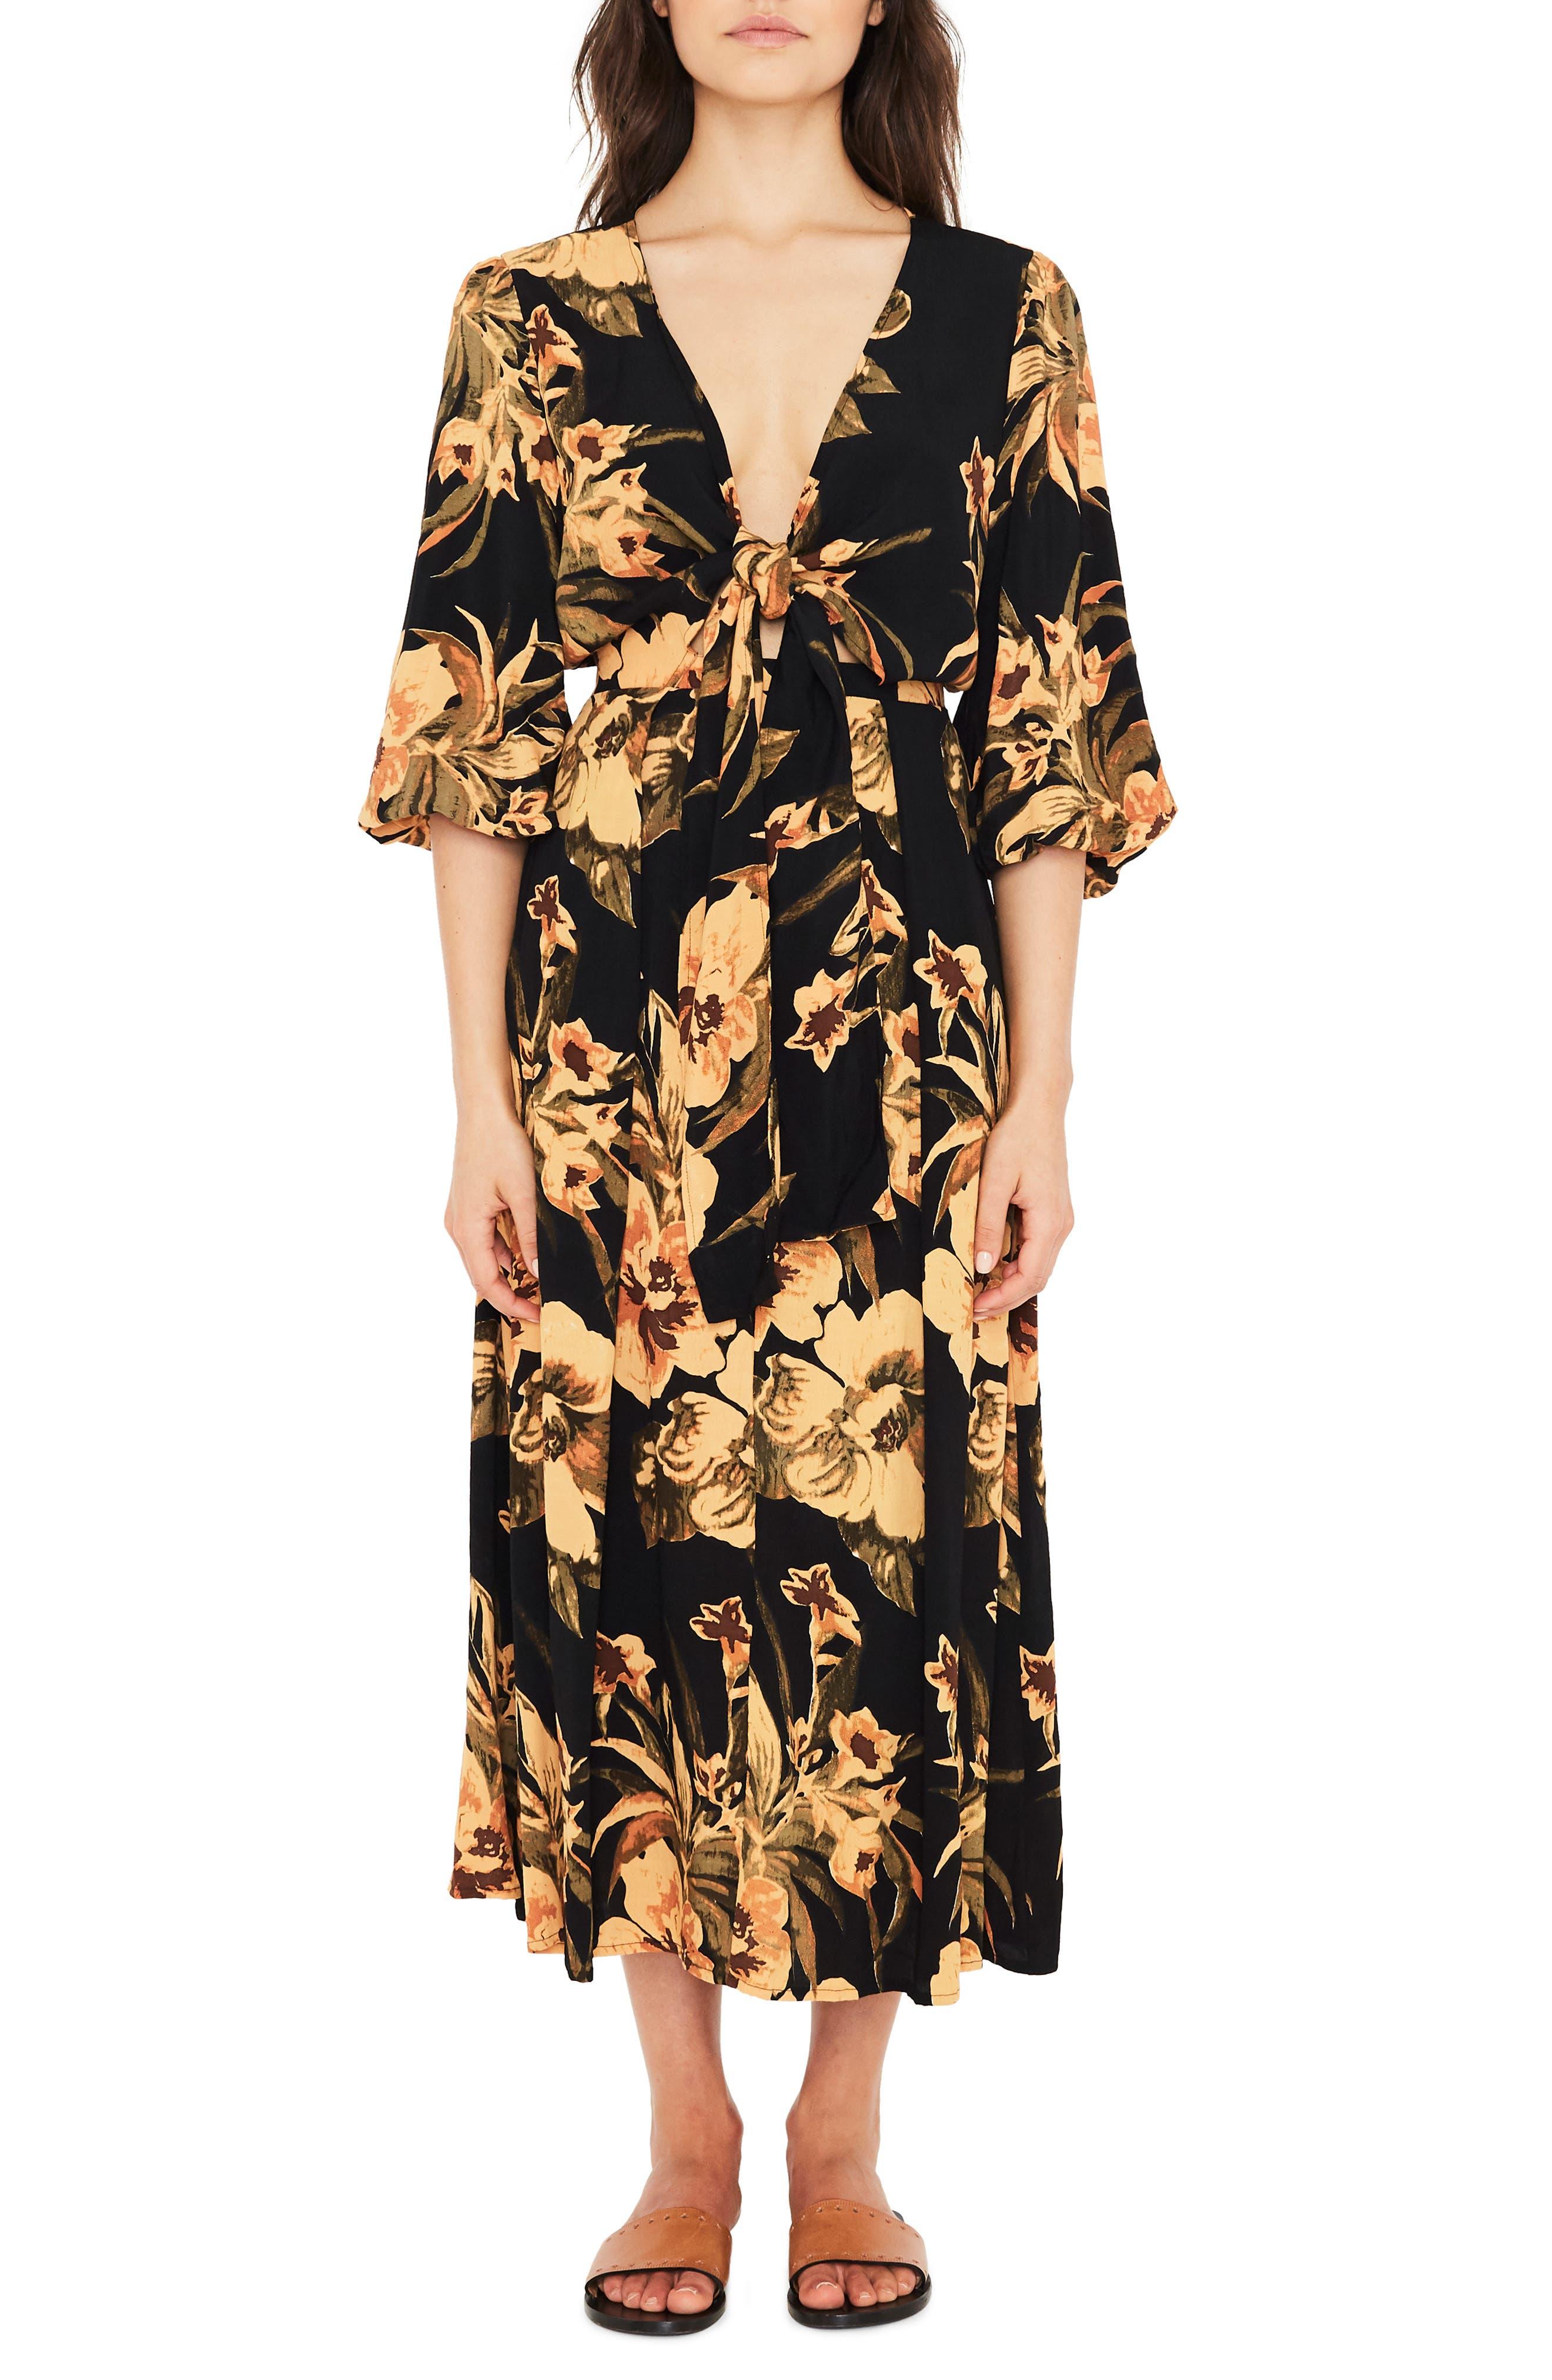 Oliviera Floral Print Cutout Midi Dress,                             Main thumbnail 1, color,                             CARIBBEAN PRINT